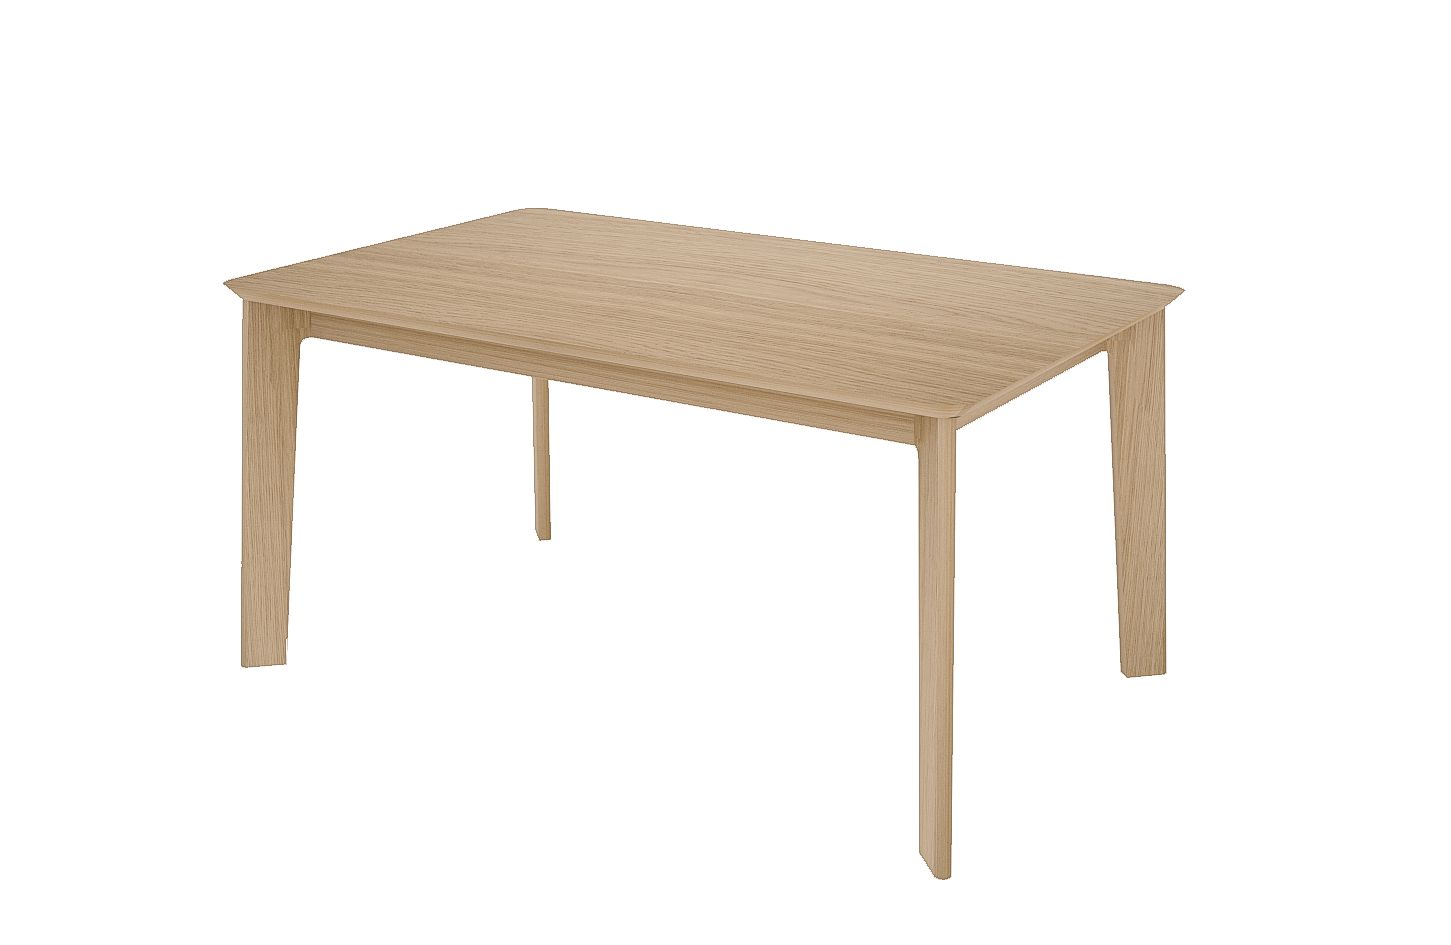 SiSi A stół rozsuwany